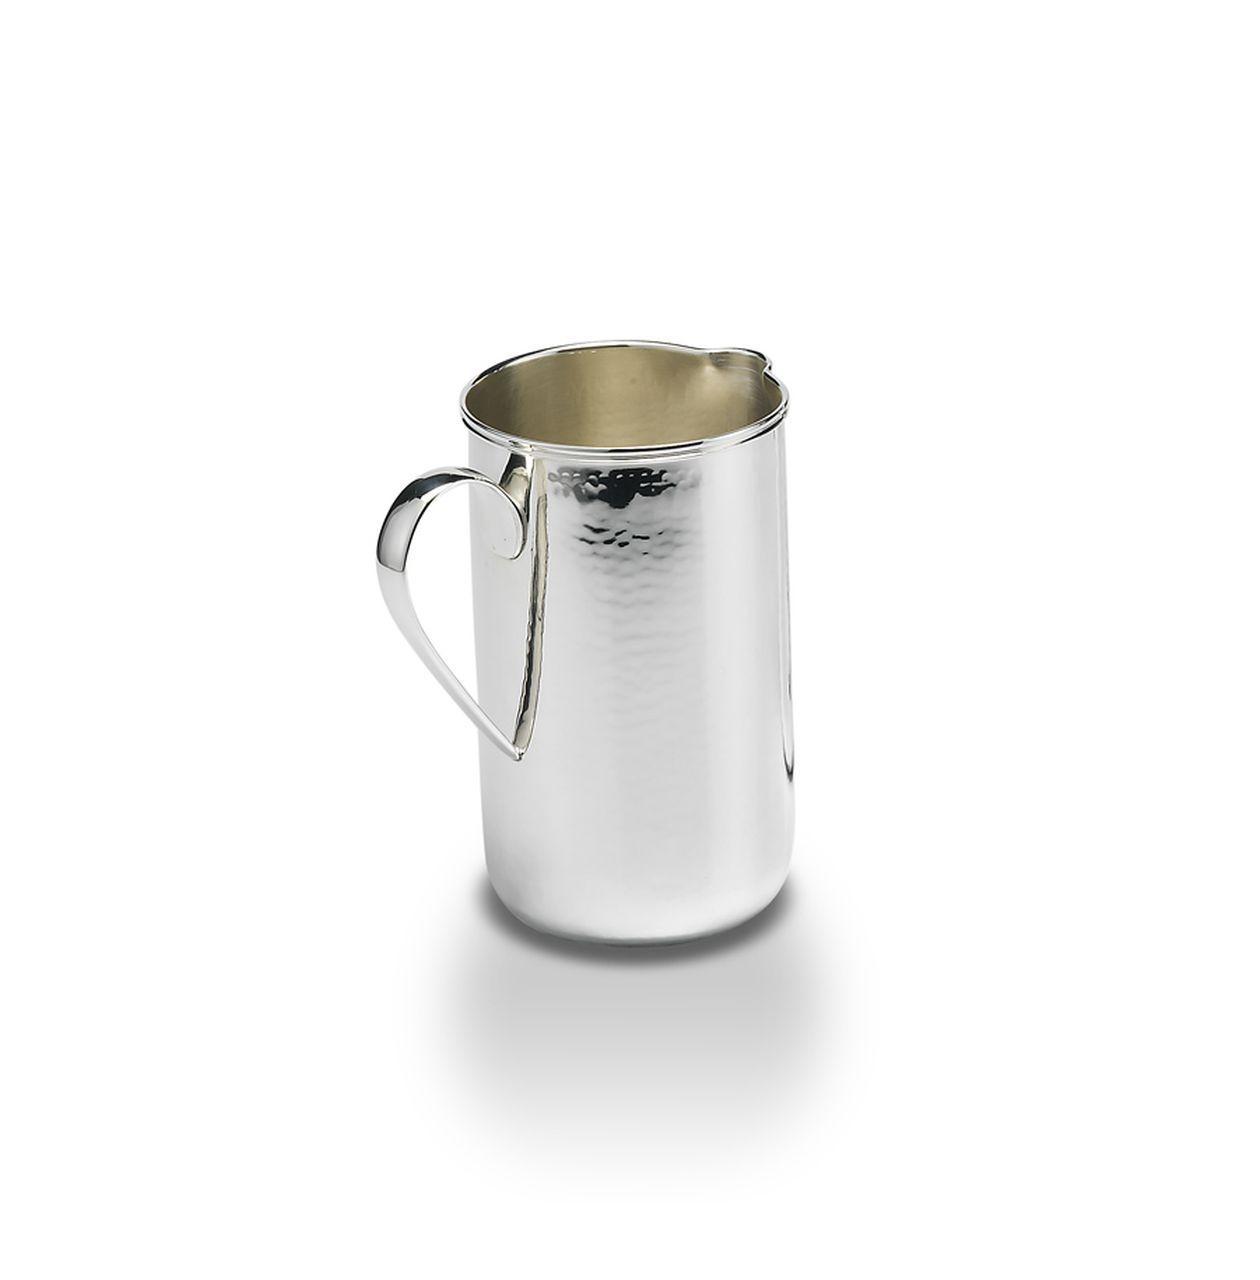 Brocca stile inglese argentato argento sheffield cm.18h diam.11